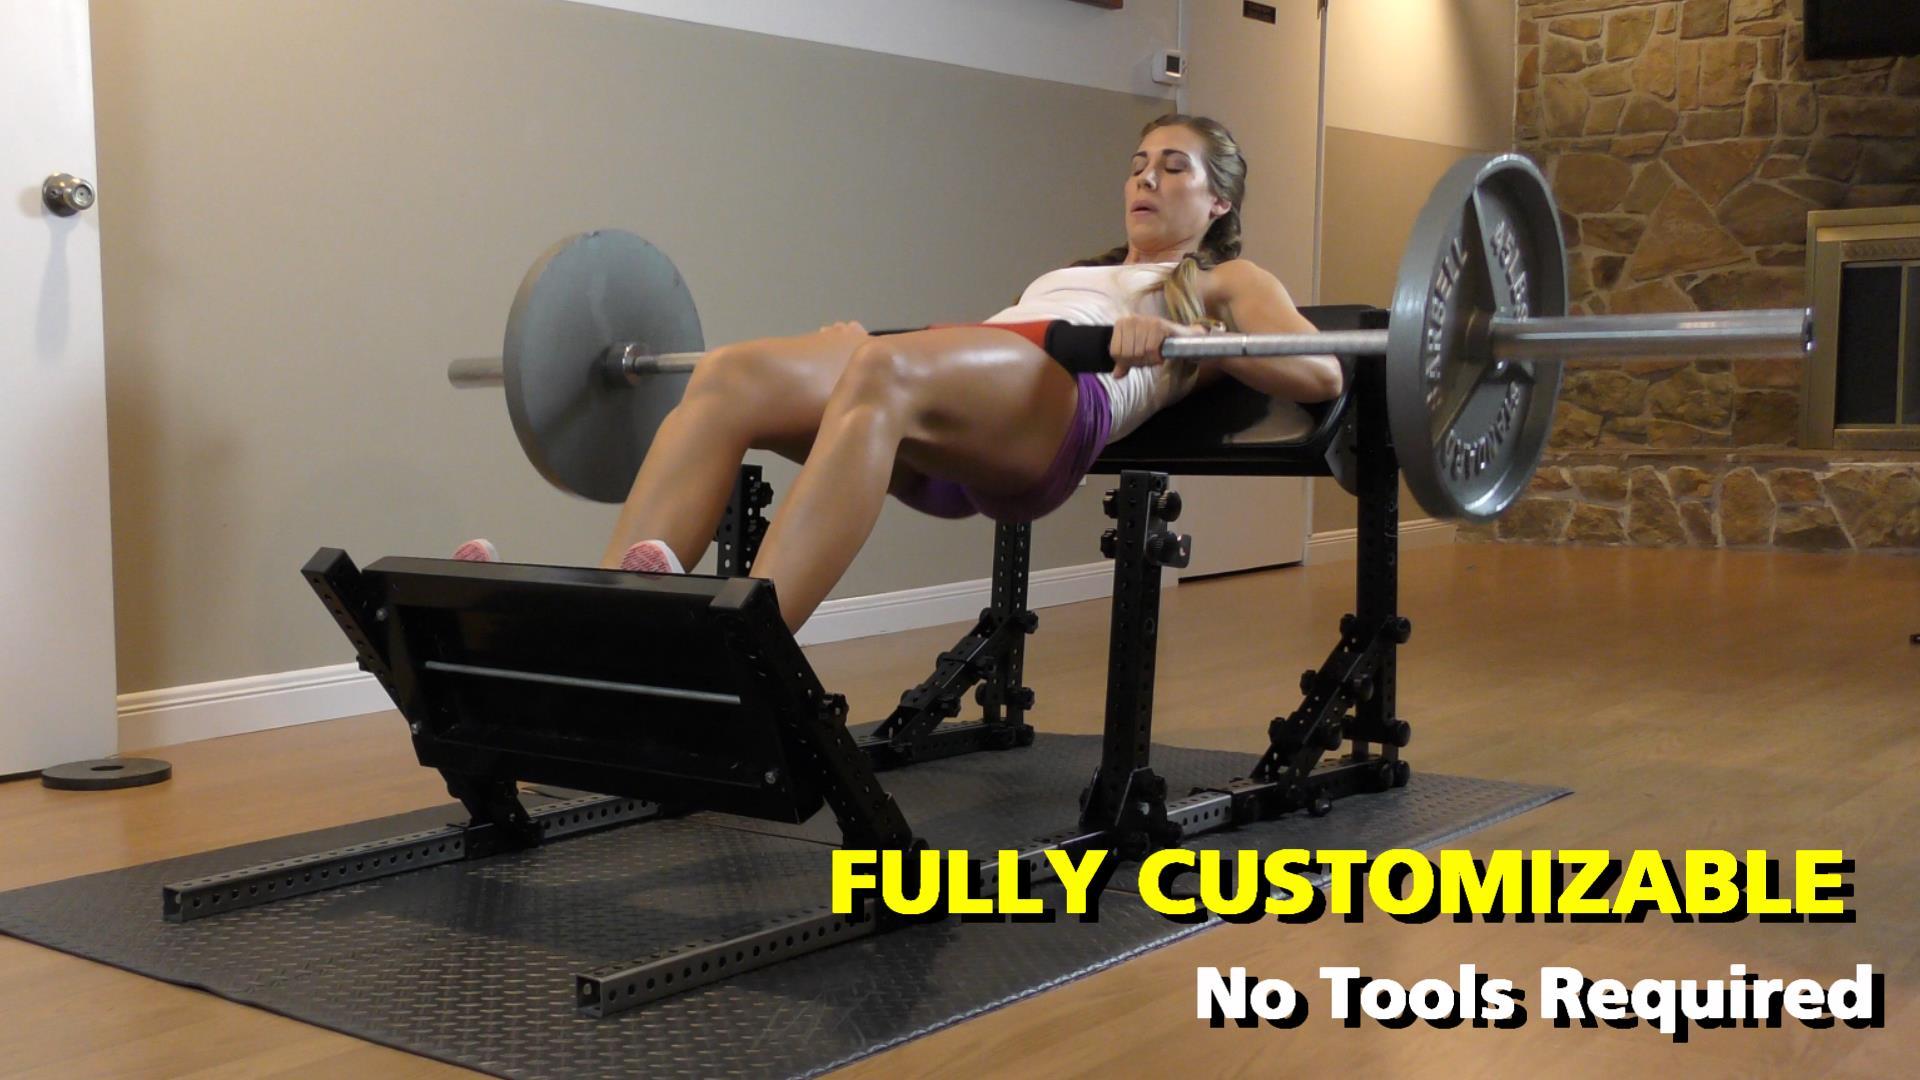 ALLN-1: Functional Fitness Bench 2k20